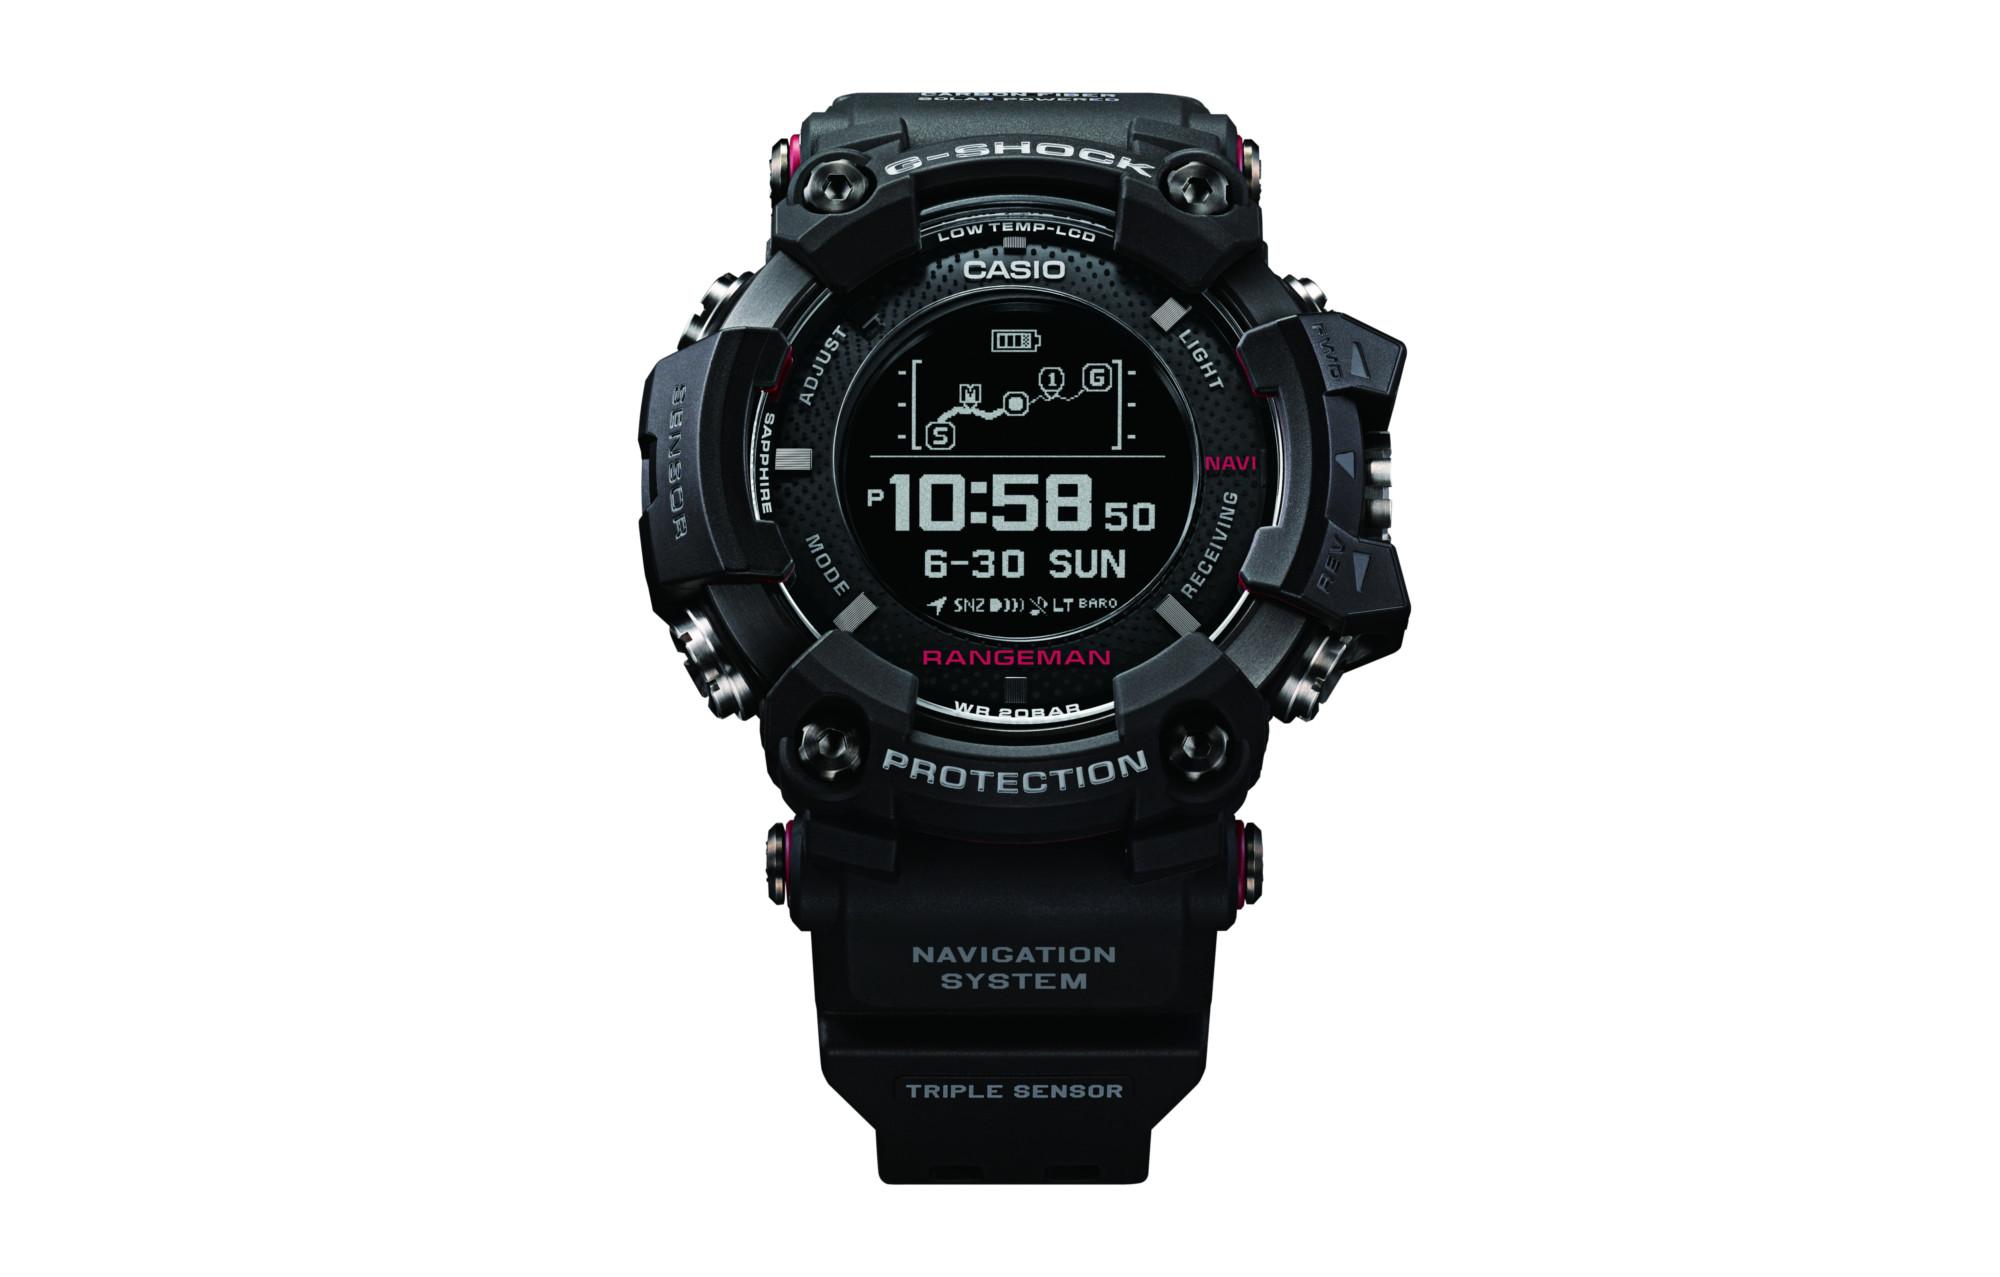 Casio Rangeman GPR B1000 Outdoor GPS Watch Black  1a7354e342b9